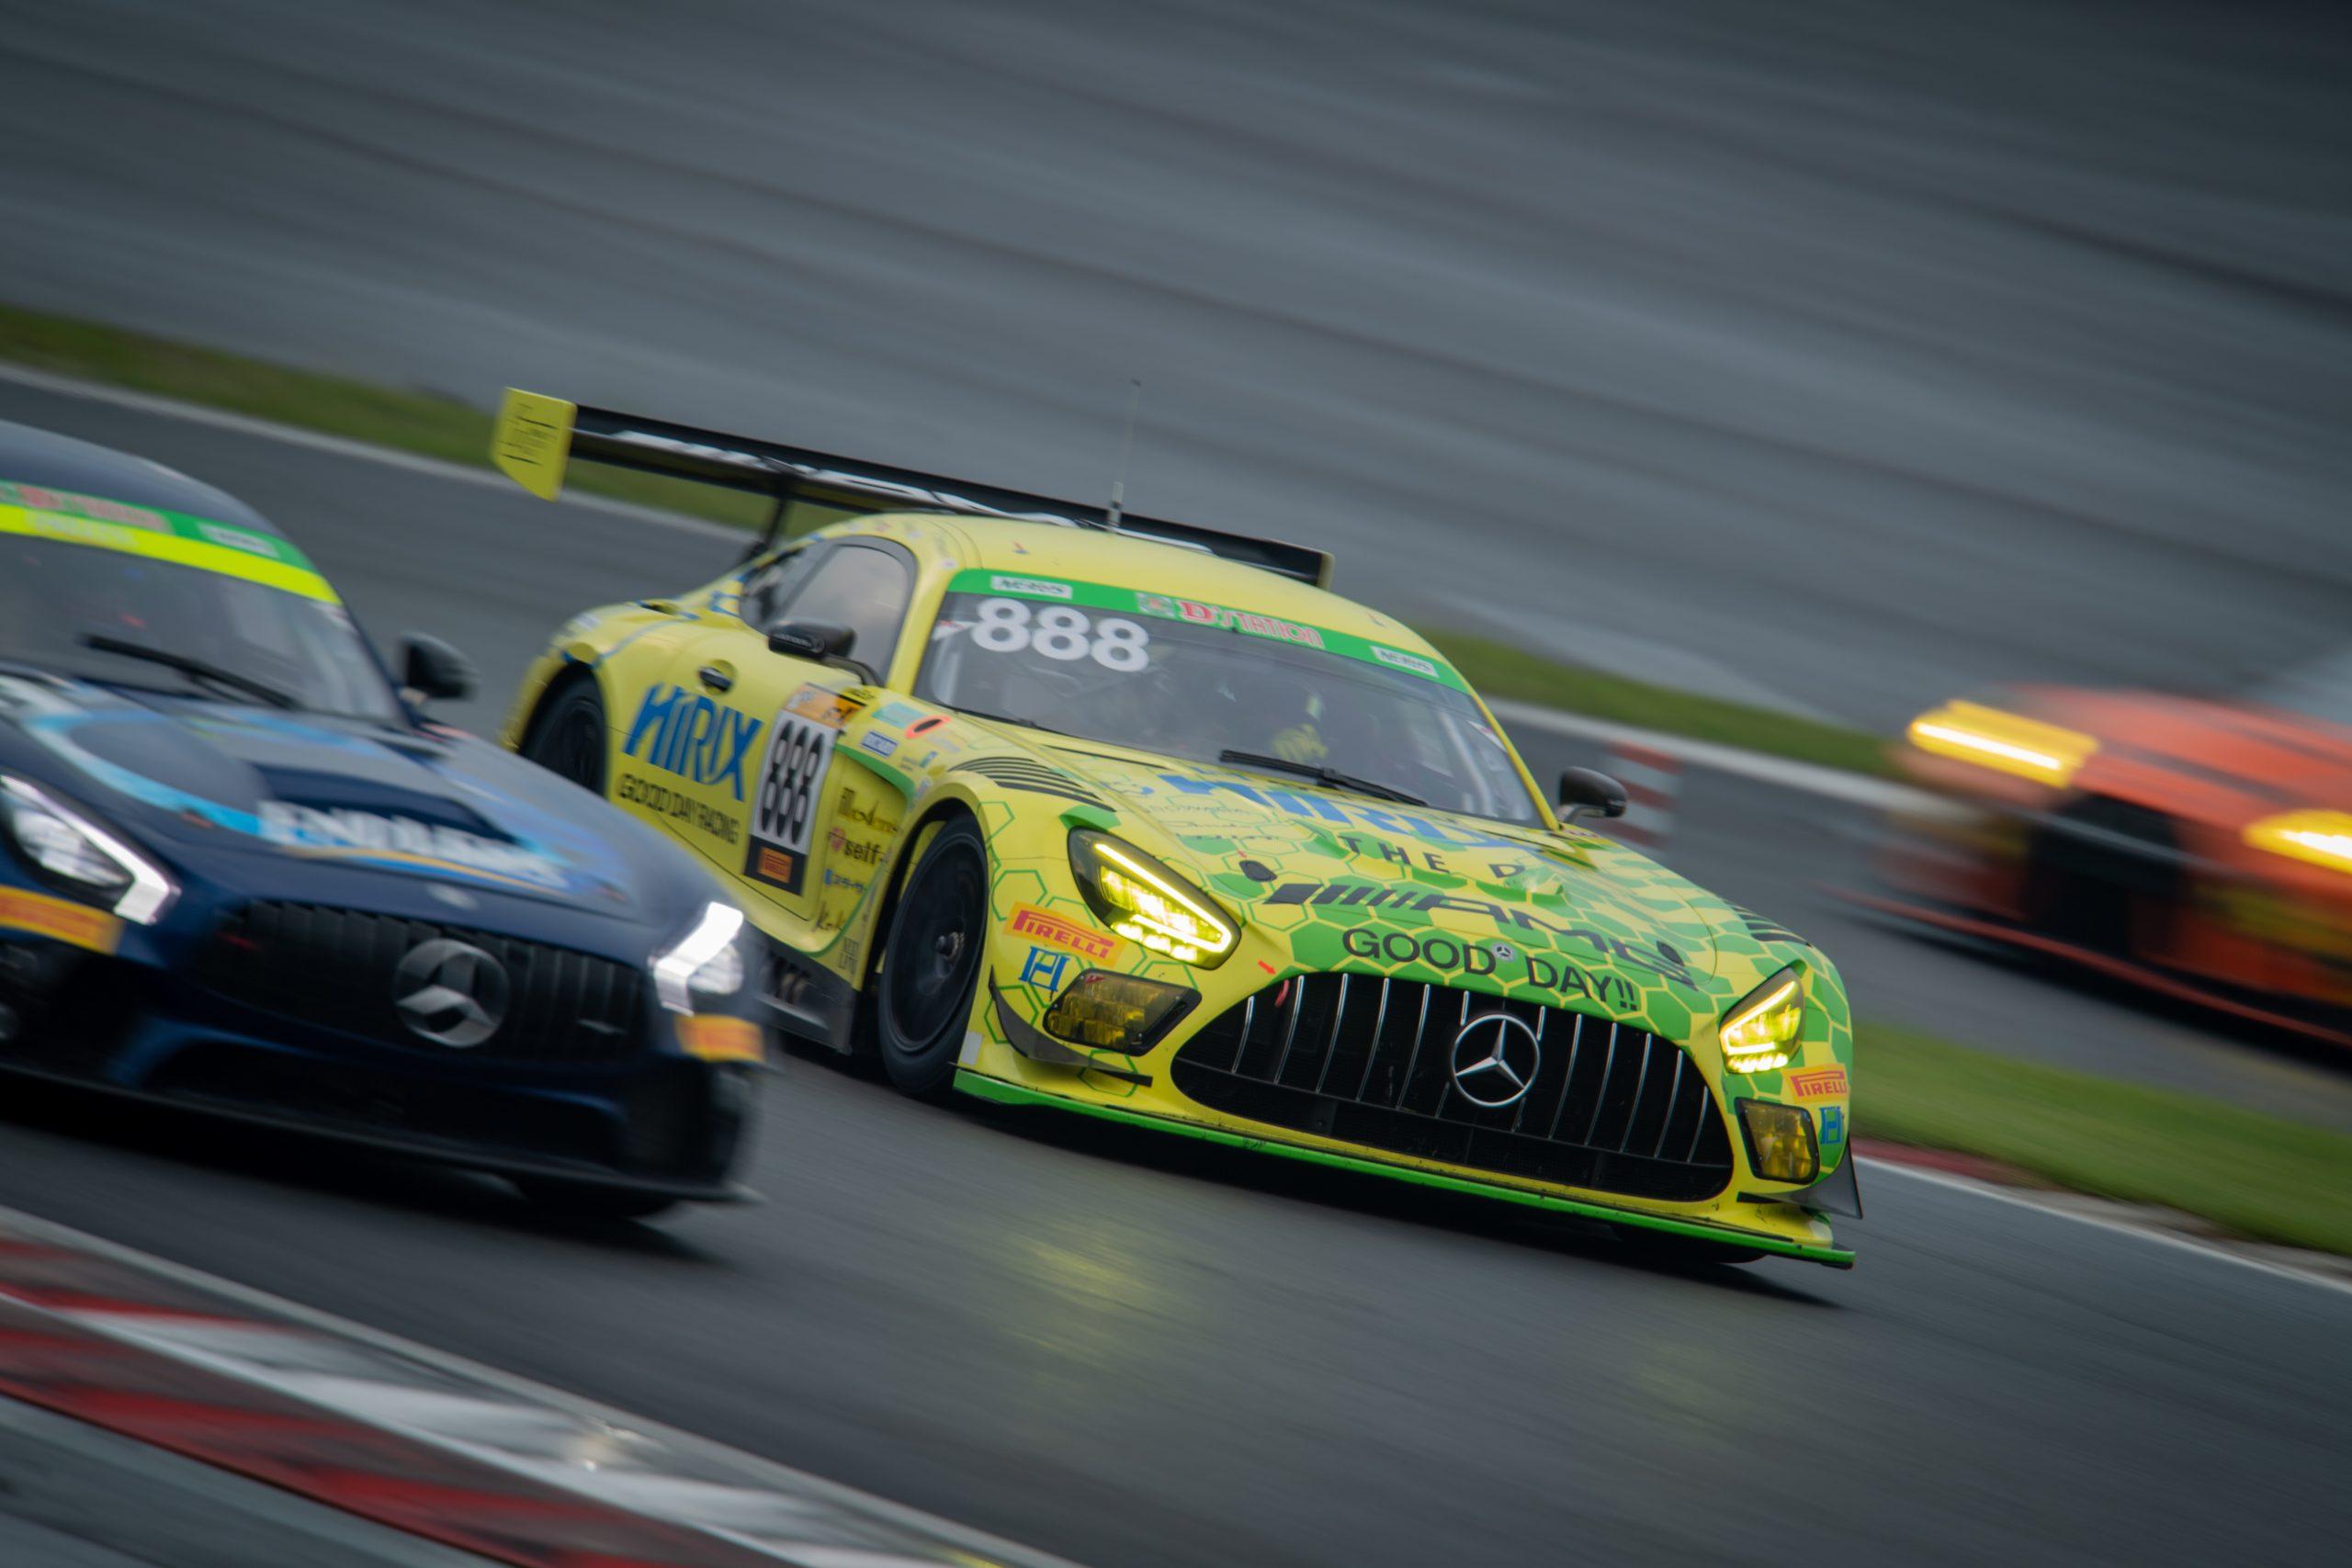 Motorsports photo #9 【Nikon D6】